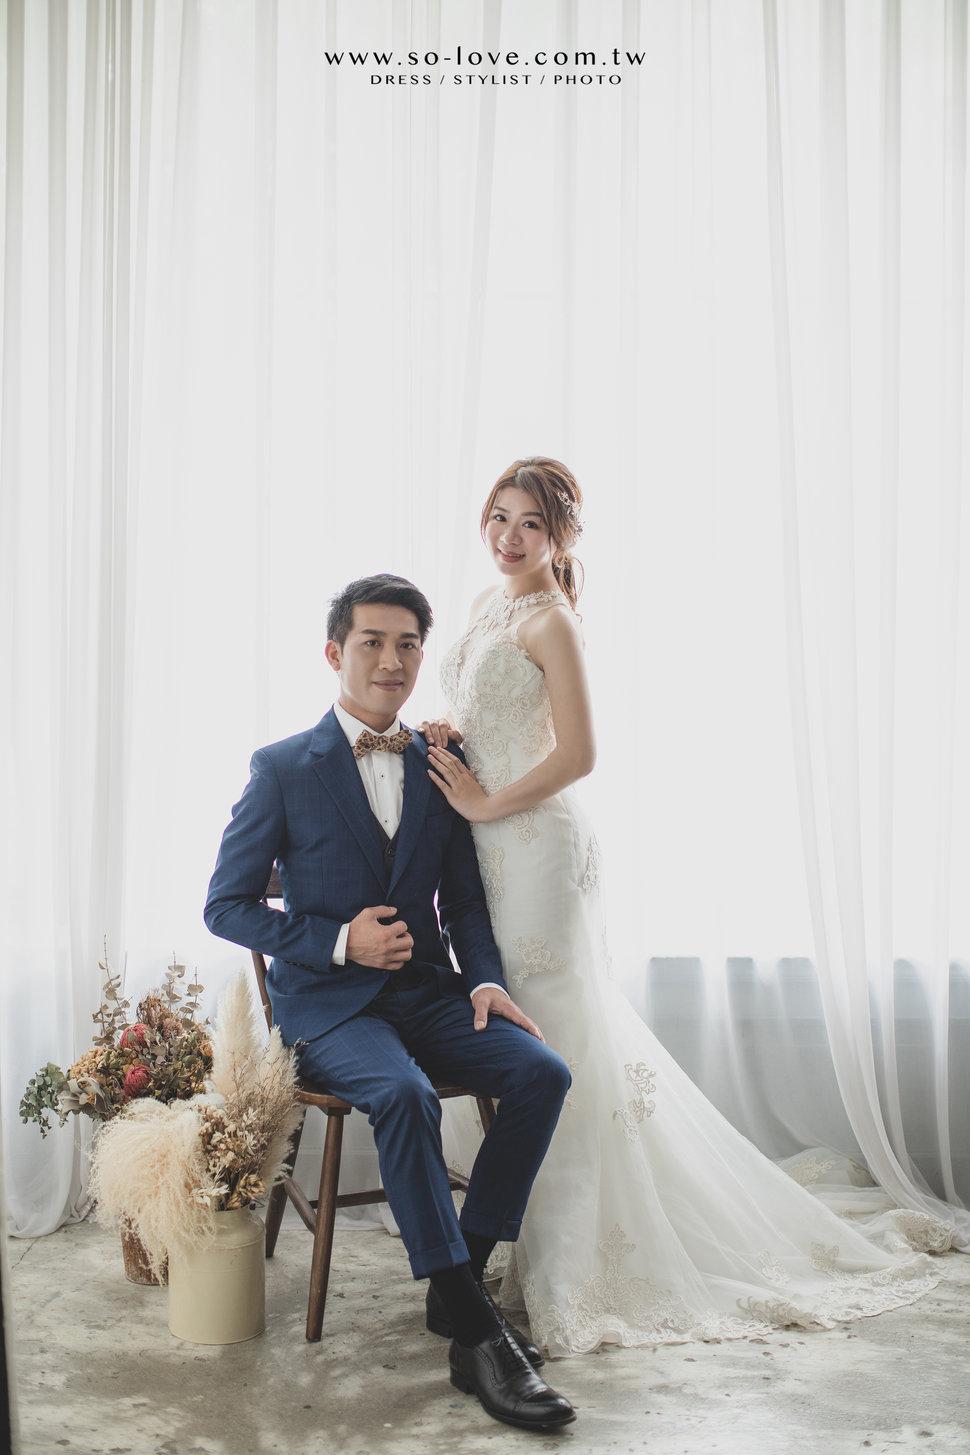 RYAN8130 - So.Love Wedding 樂樂蕾絲《結婚吧》